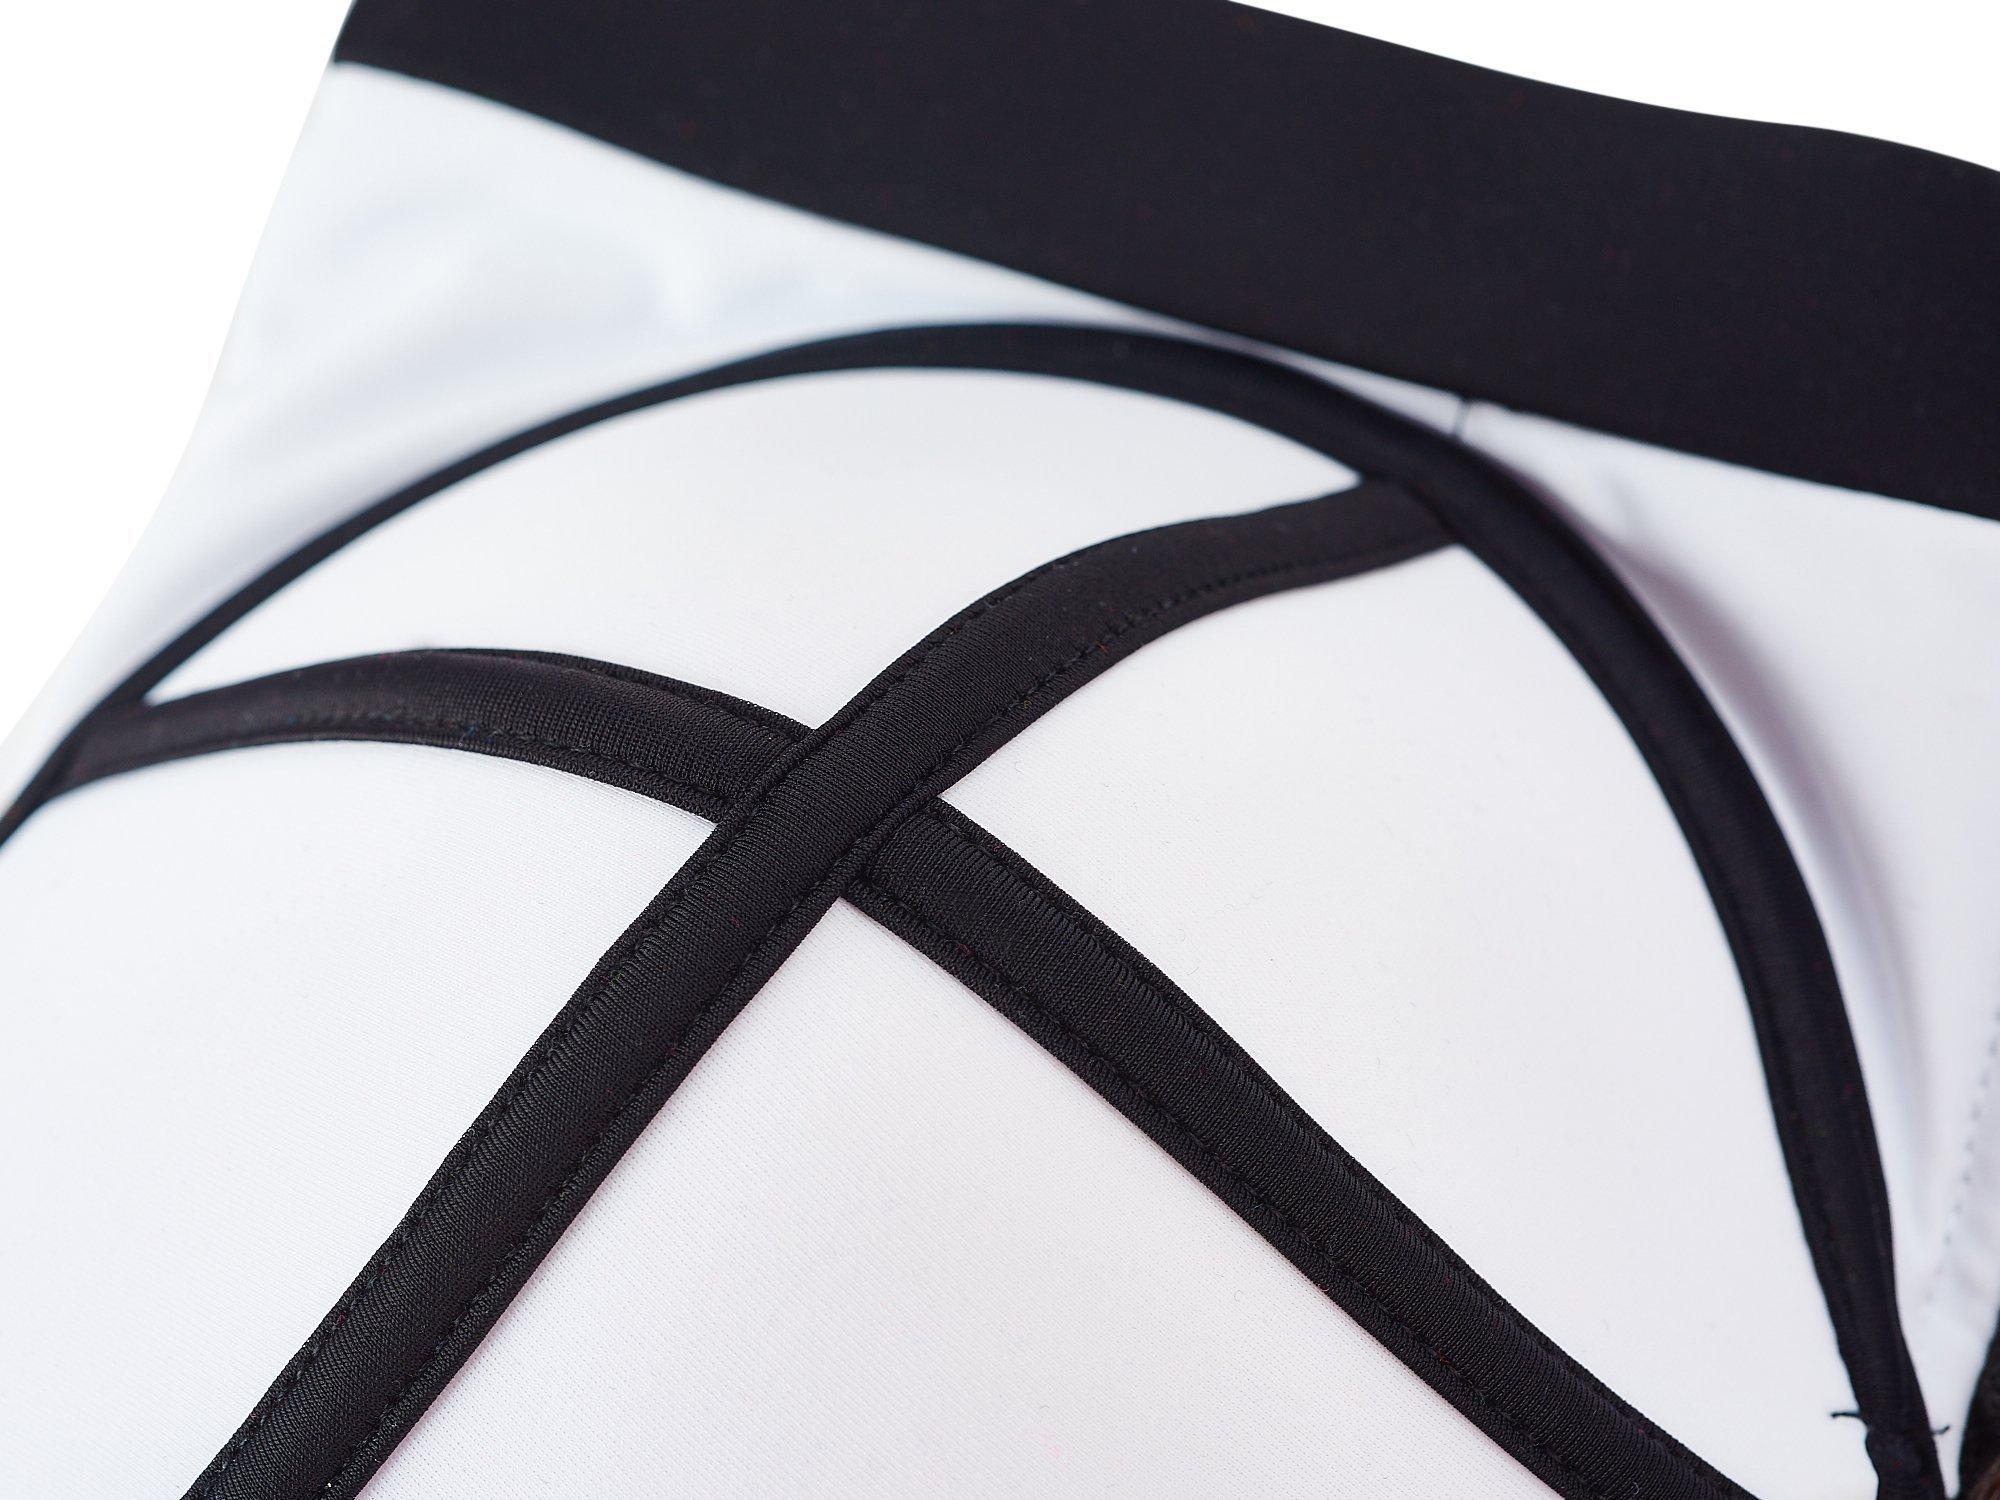 LA PLAGE Women's Colorful High Waist Padded Bathing Suit Size US XX-Large White by LA PLAGE (Image #6)